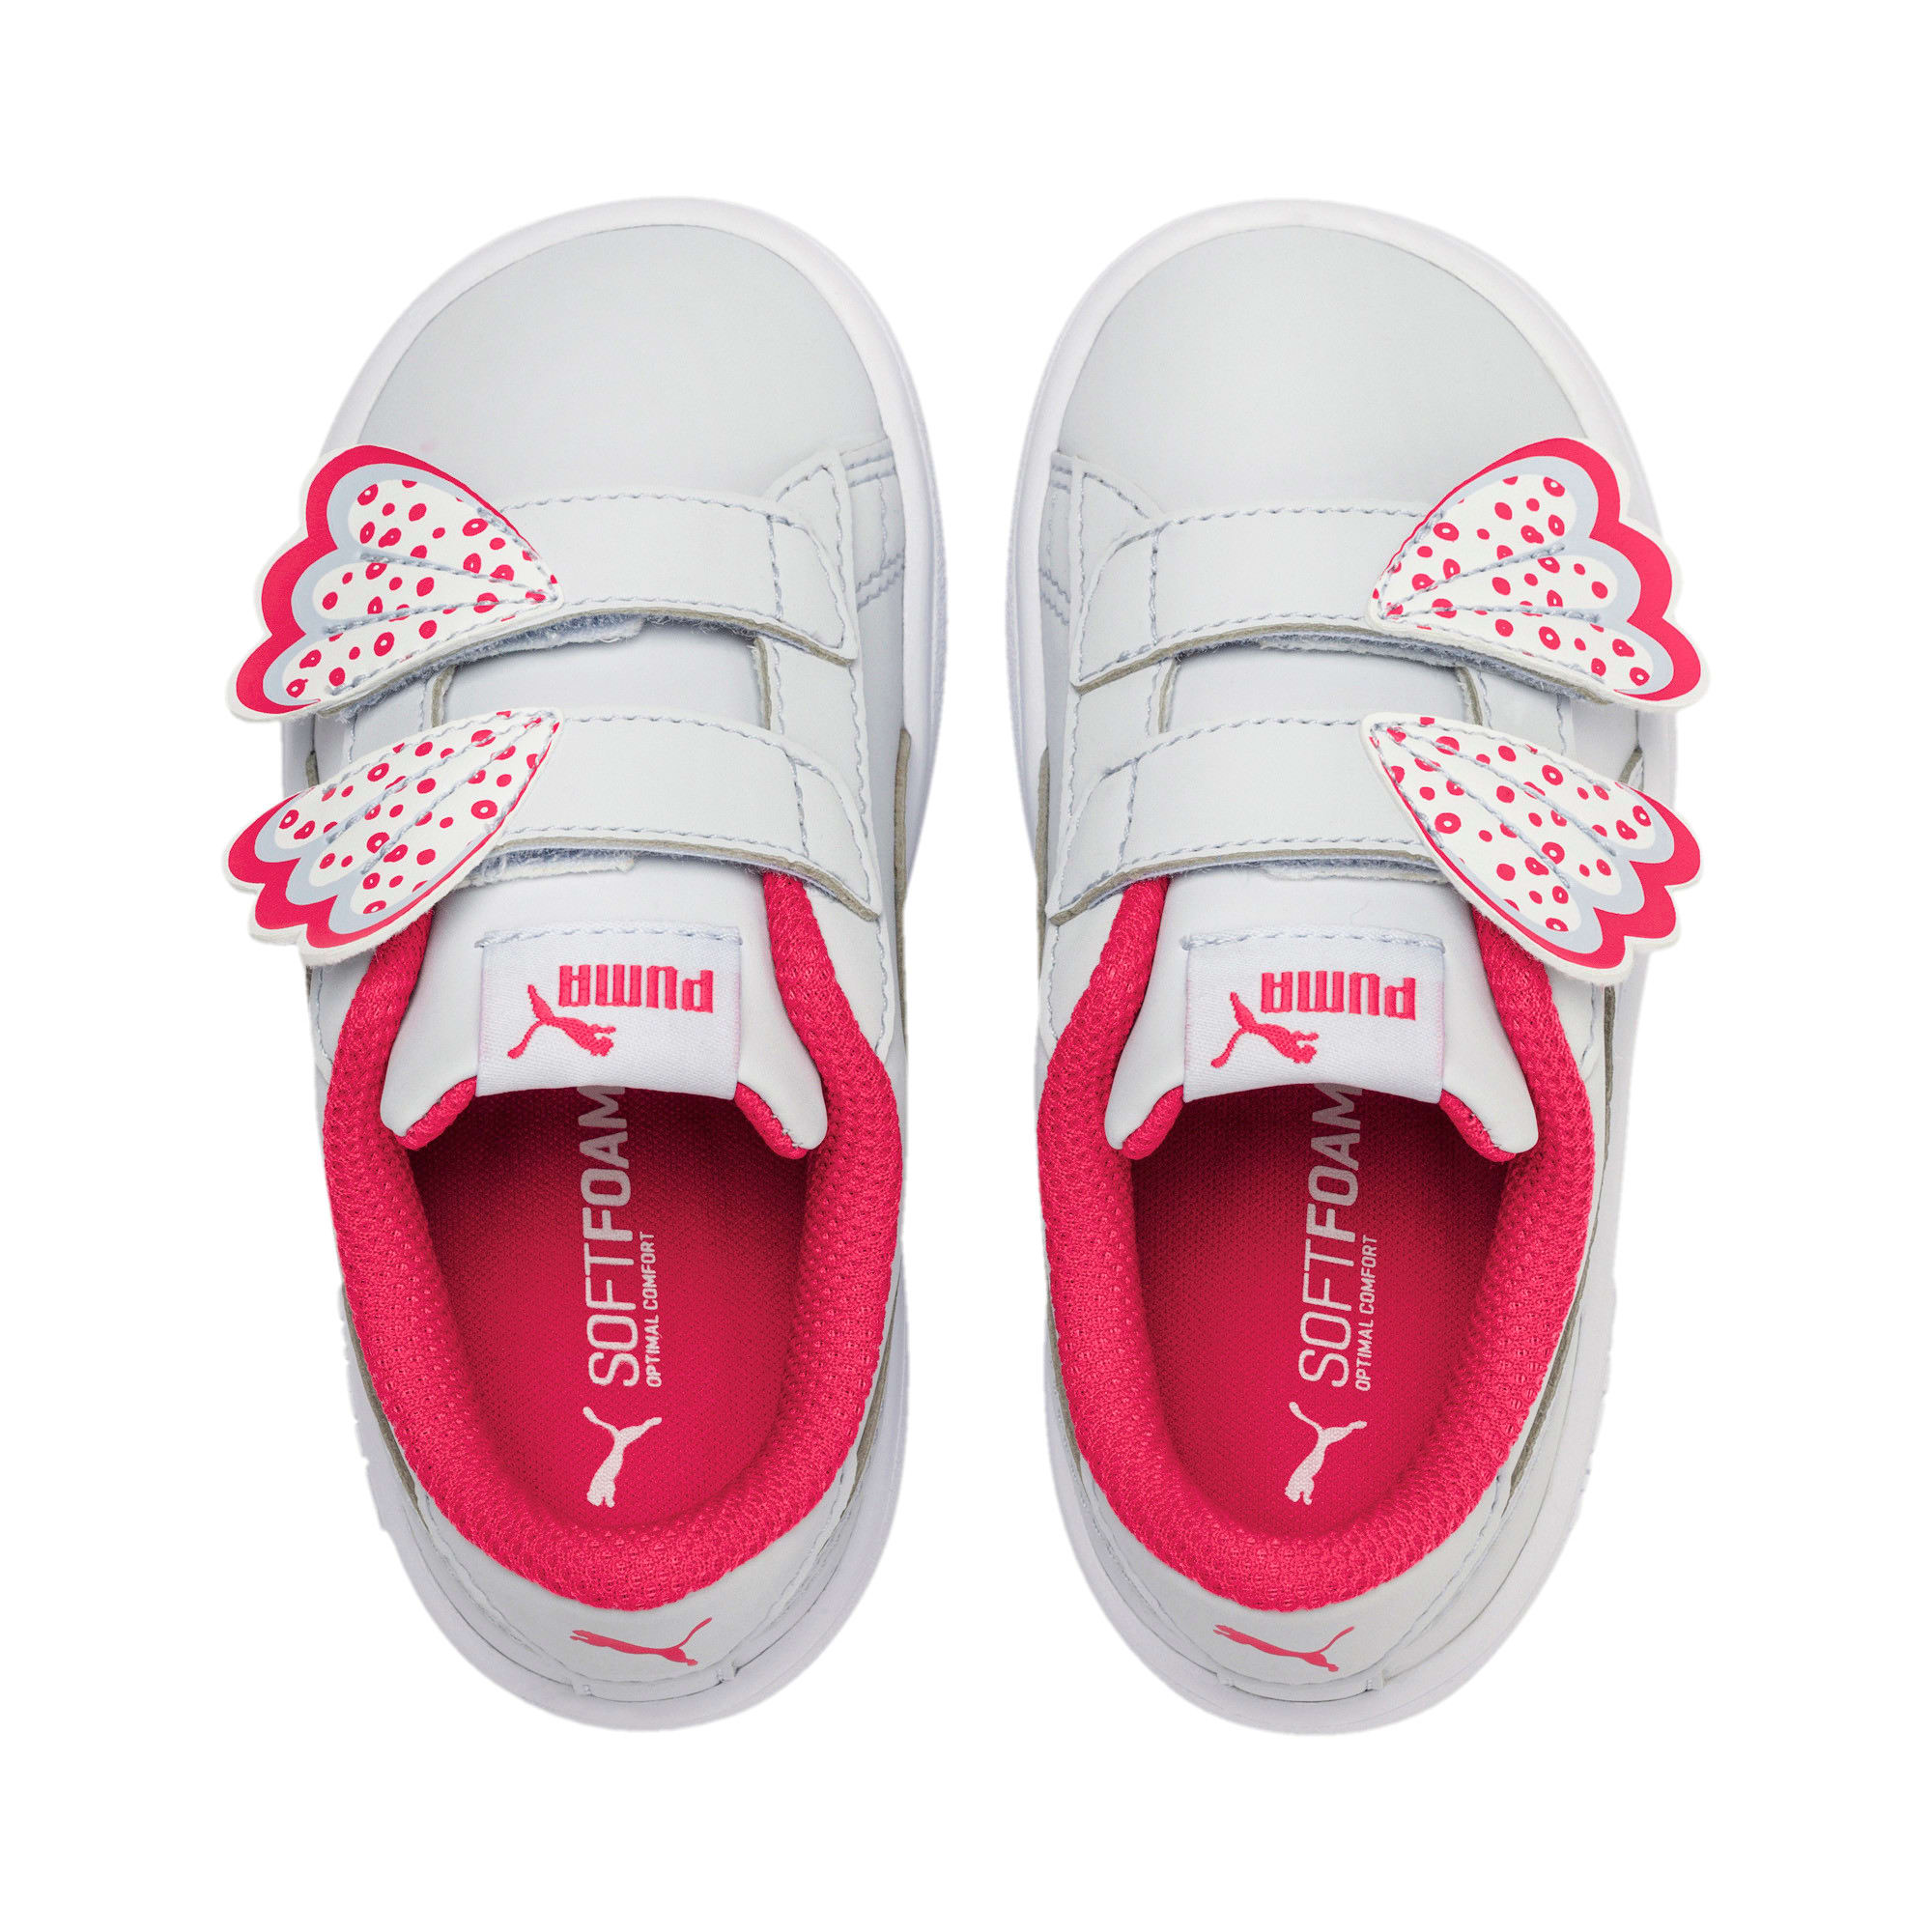 Thumbnail 6 of PUMA Smash v2 Butterfly AC Toddler Shoes, Heather-Nrgy Rose-Puma White, medium